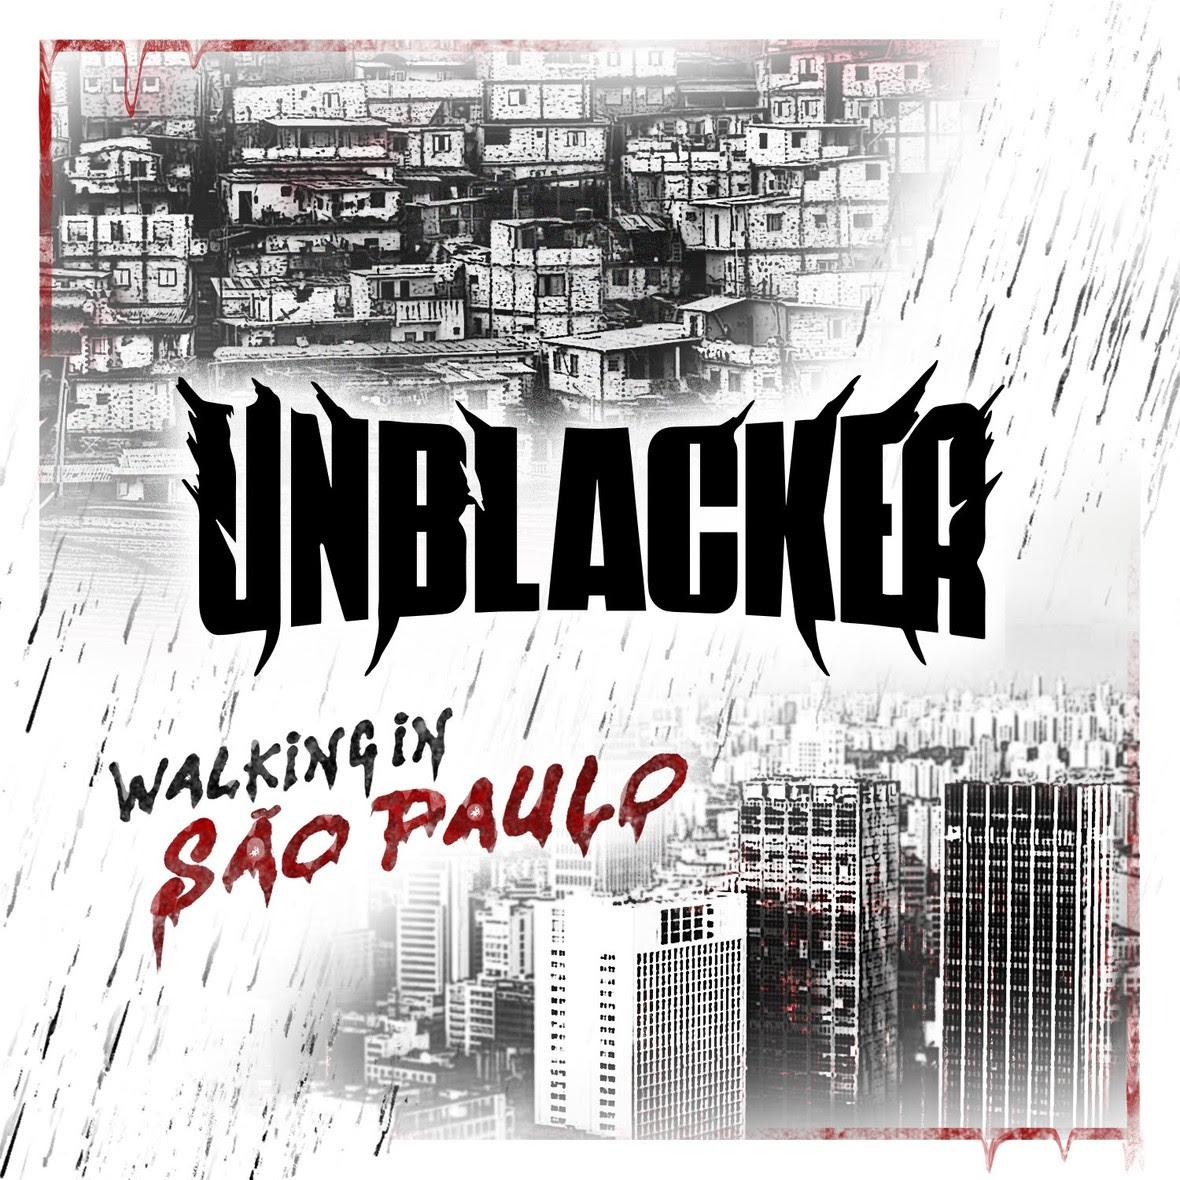 unblacker sp capa v8 copy